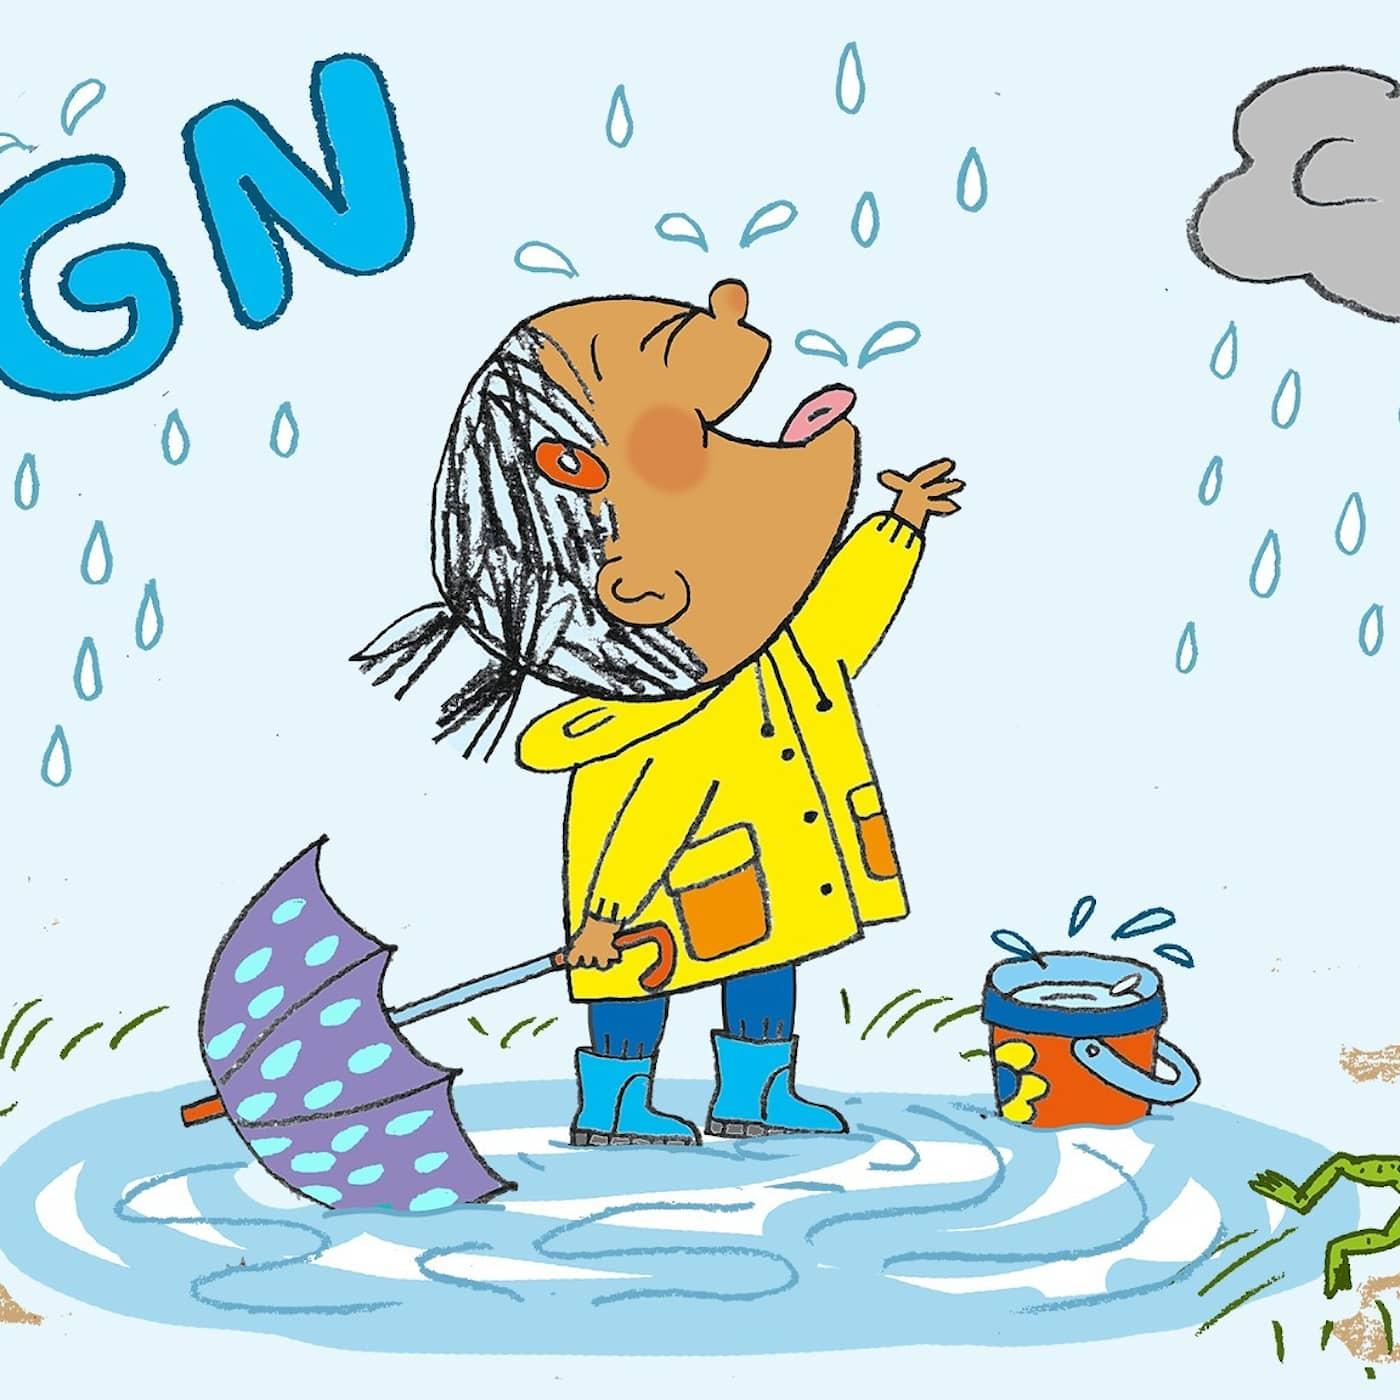 Plipp plopp regn